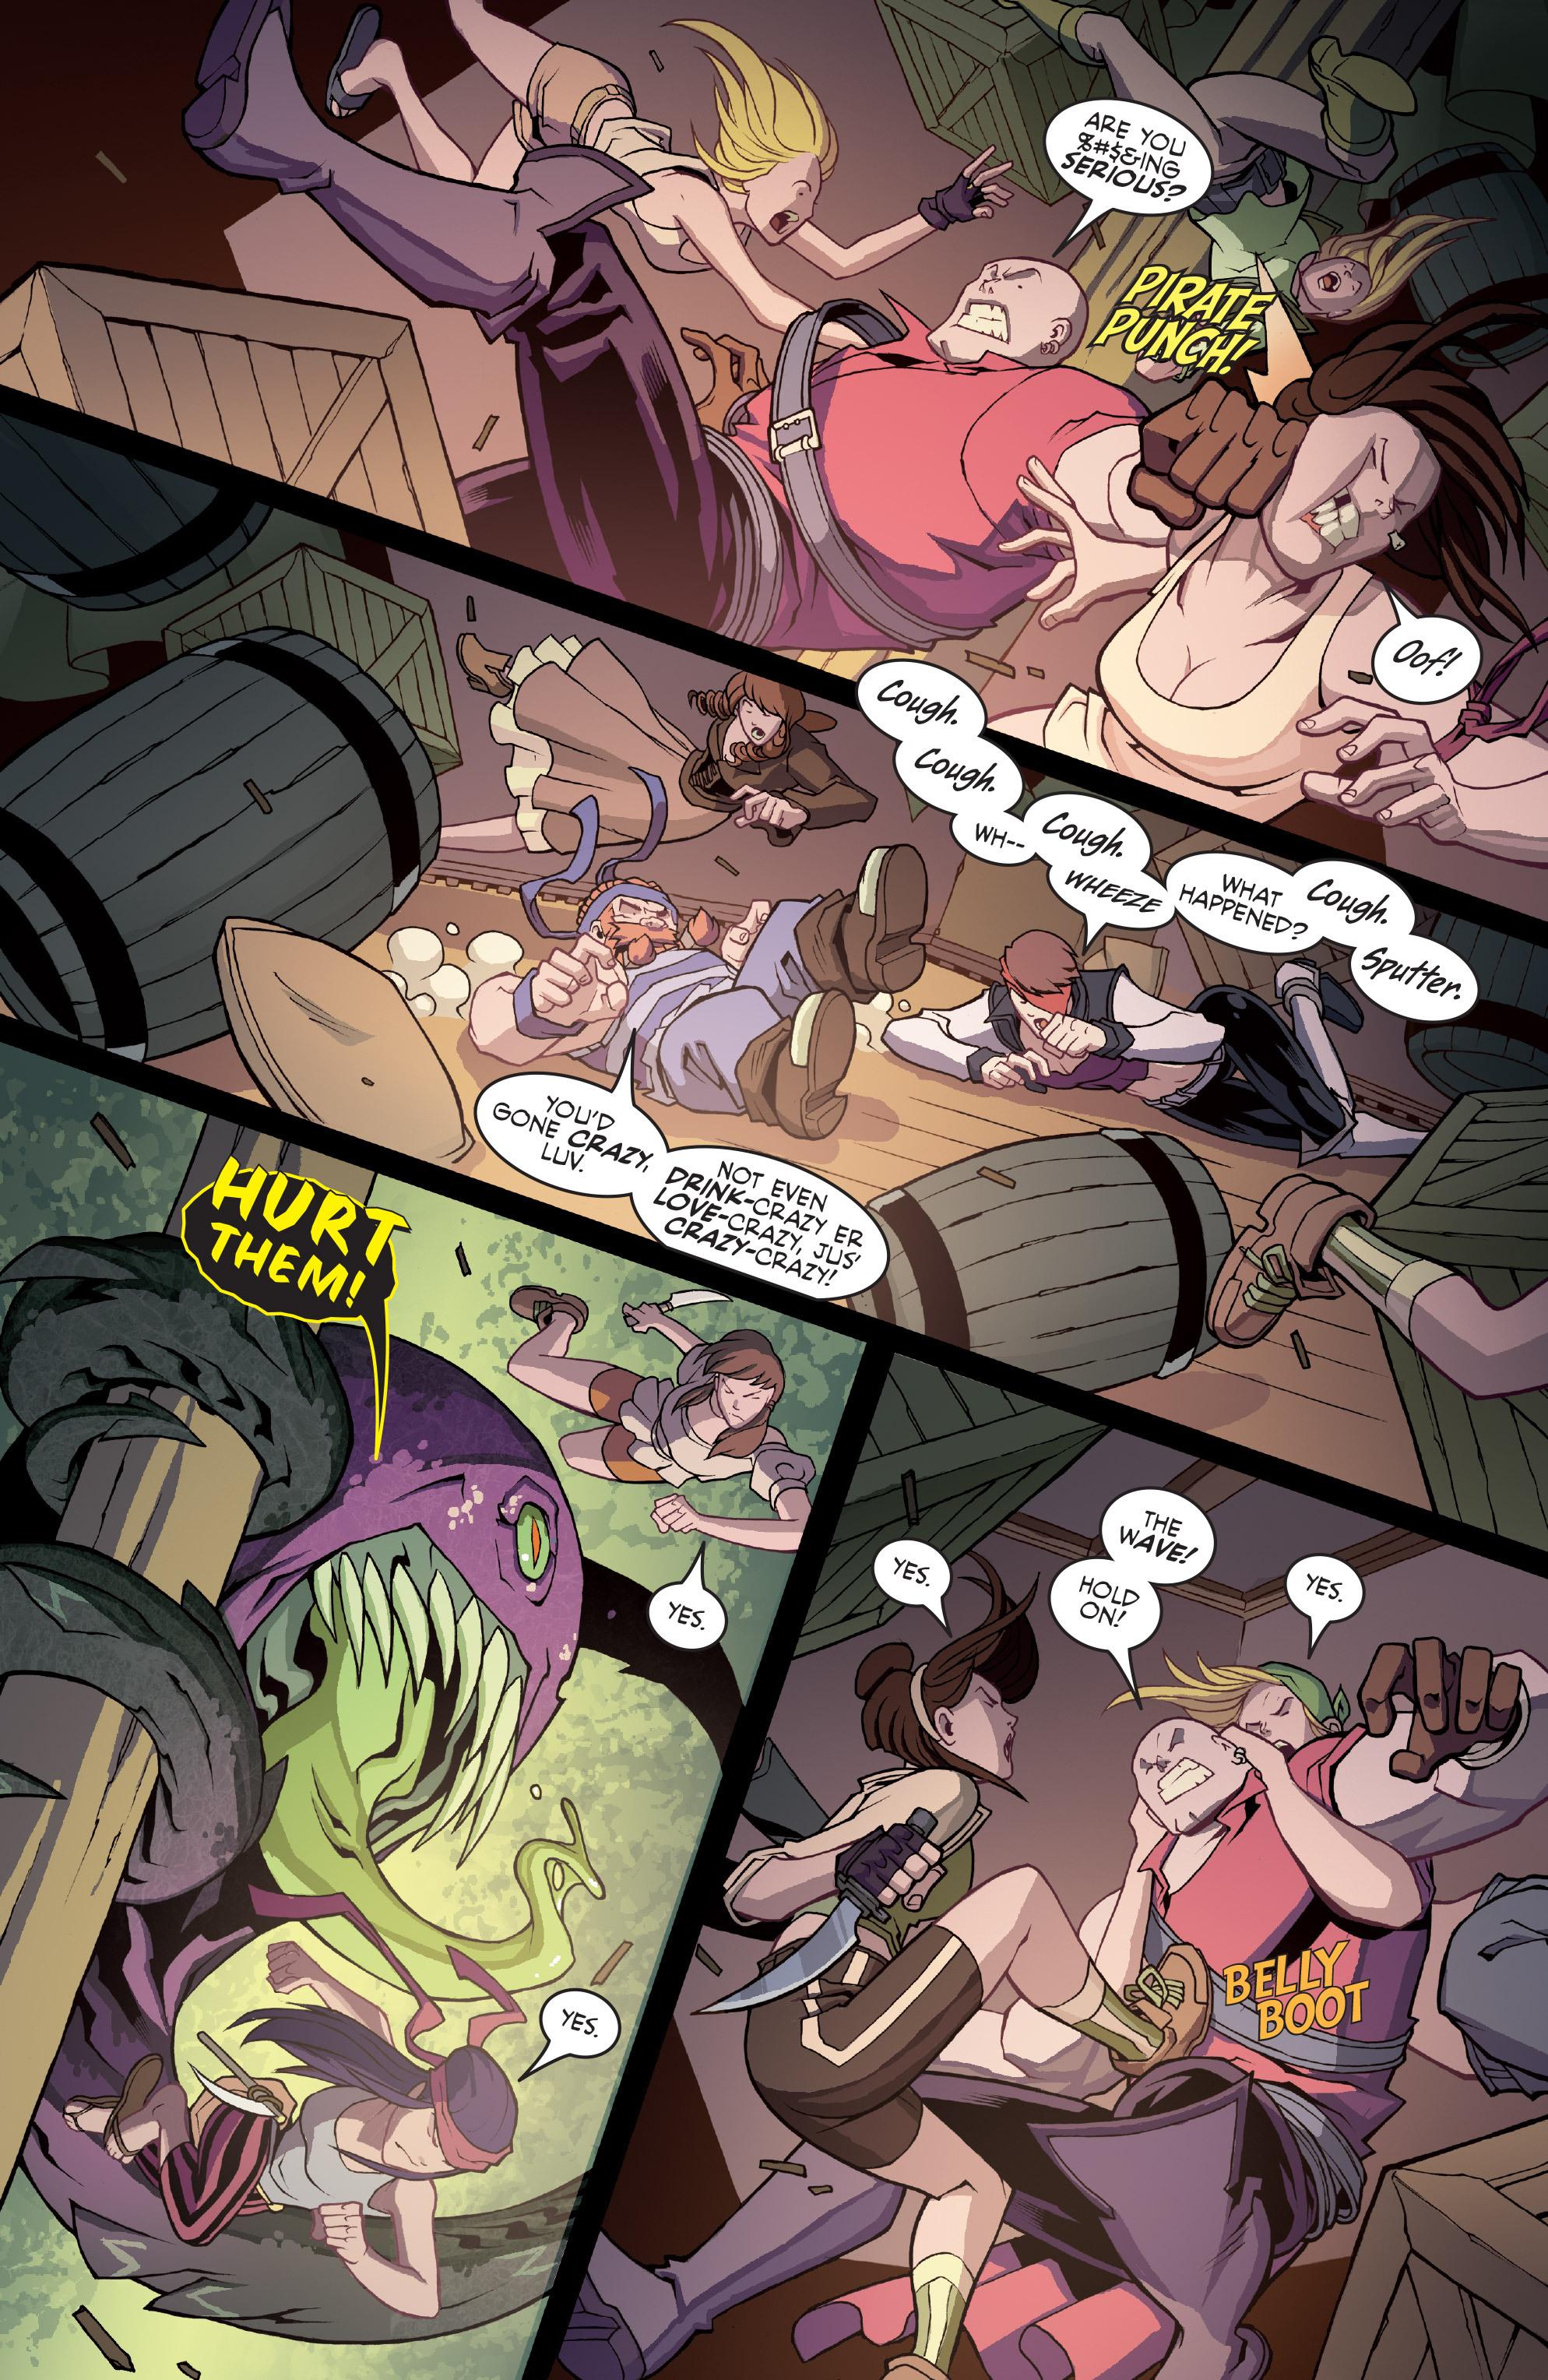 Read online Skullkickers comic -  Issue #16 - 15